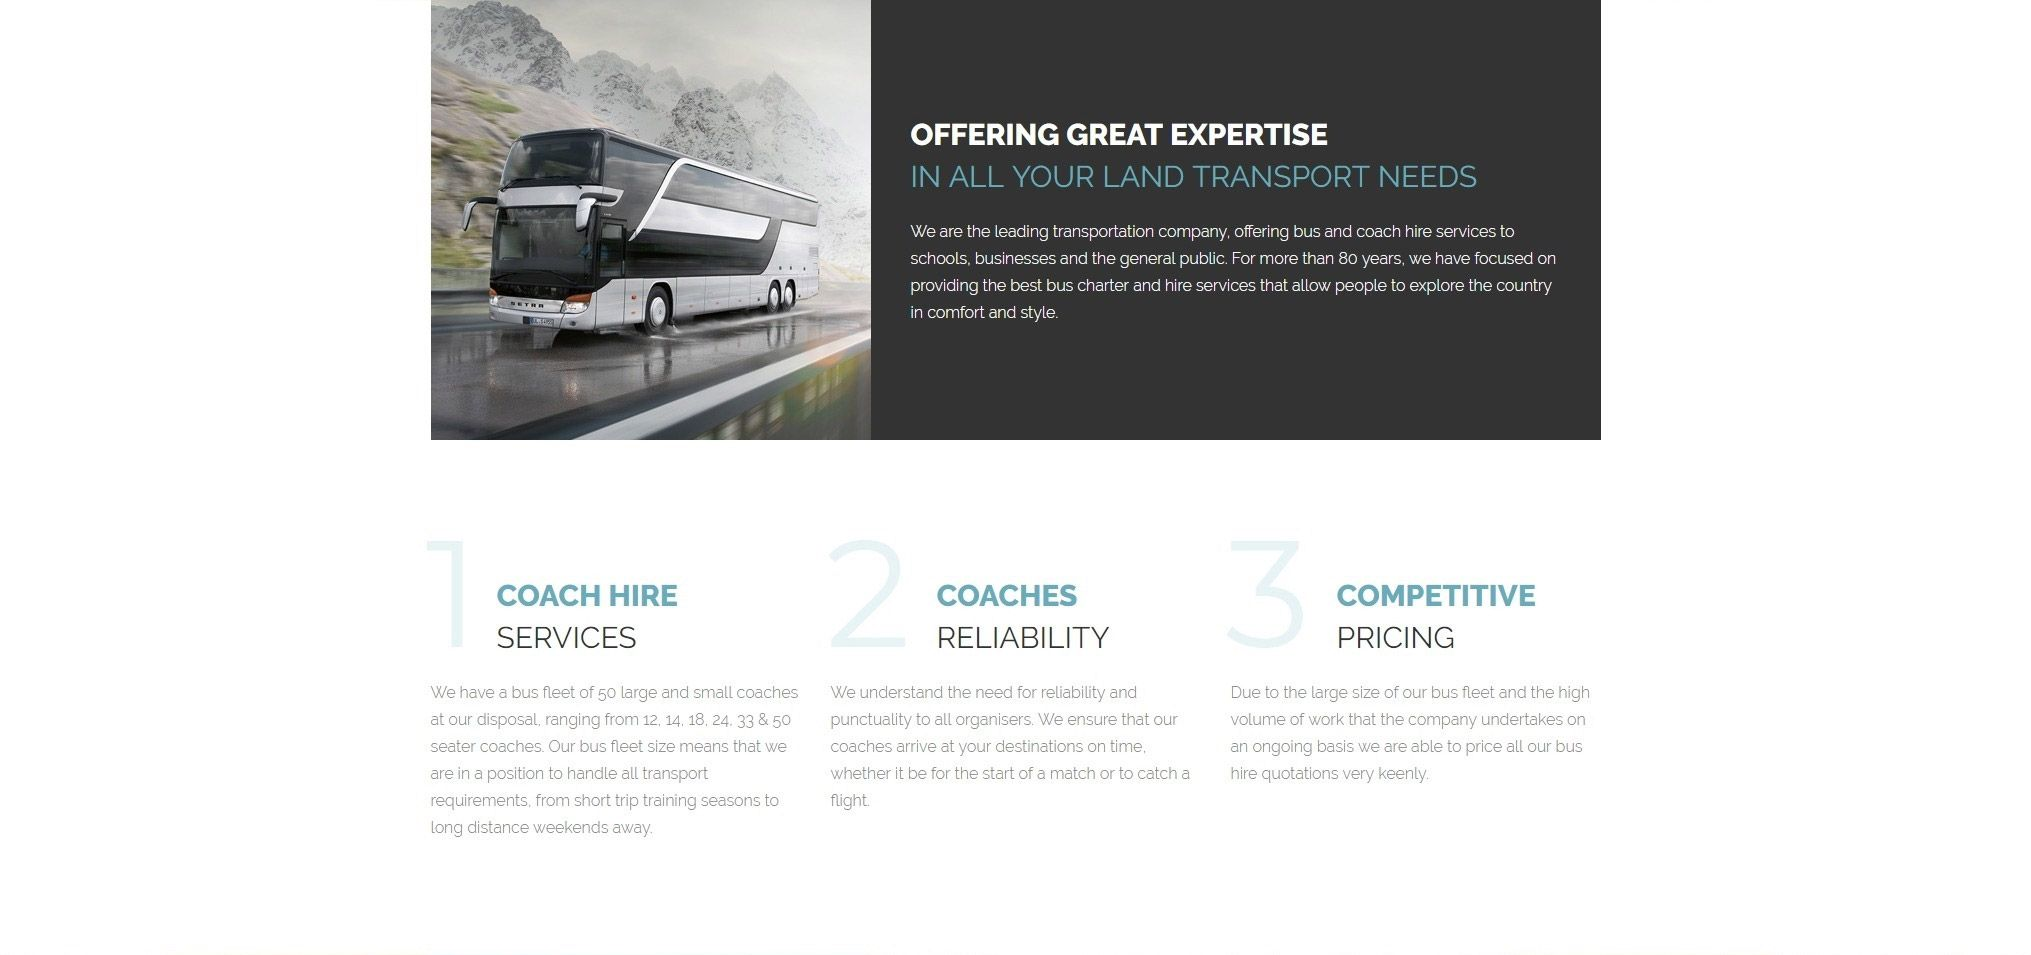 bus and coach hire bus website template website. Black Bedroom Furniture Sets. Home Design Ideas